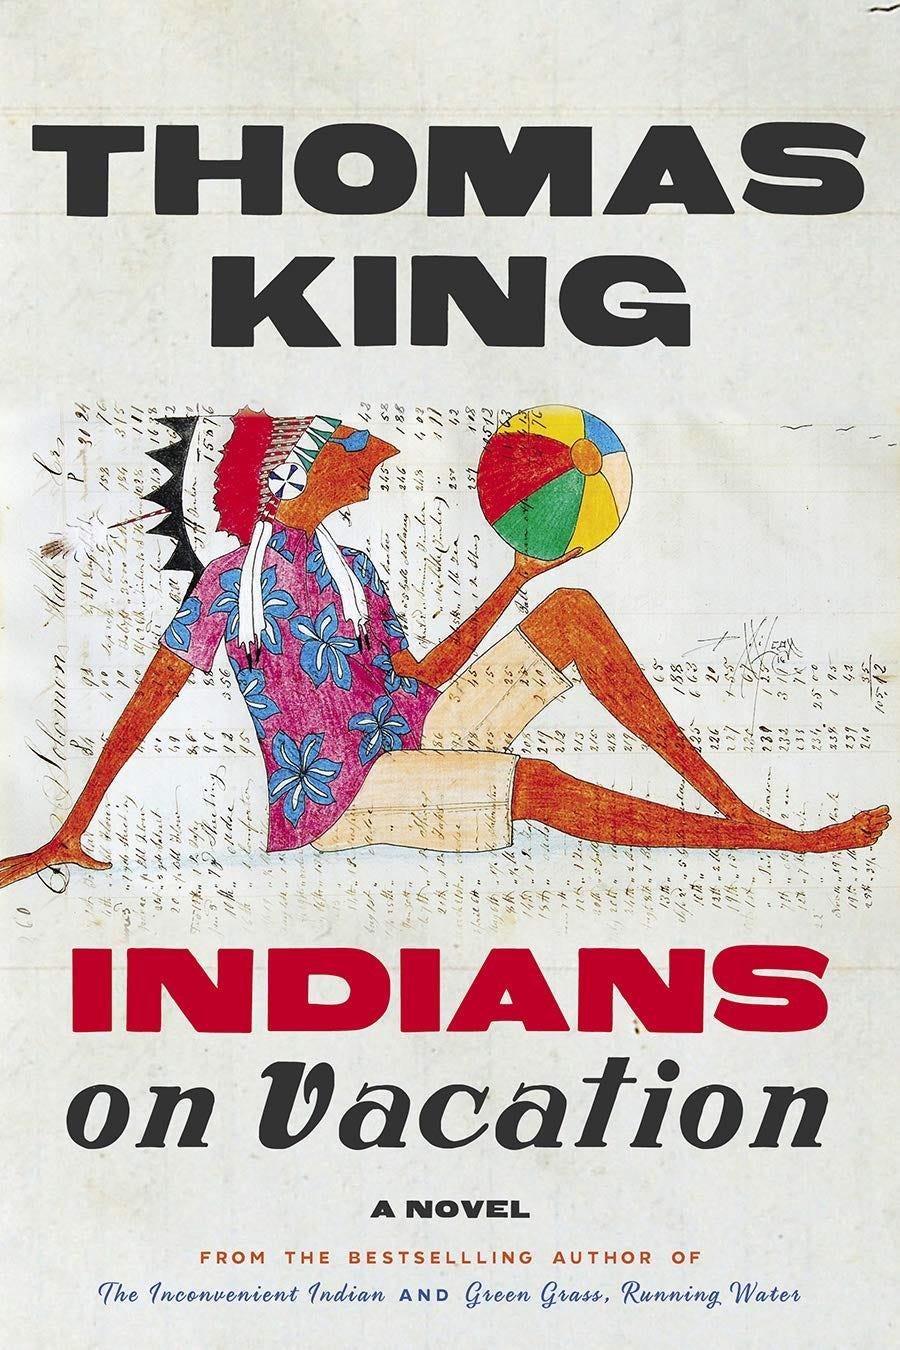 Amazon.com: Indians on Vacation: A Novel: 9781443460545: King, Thomas: Books